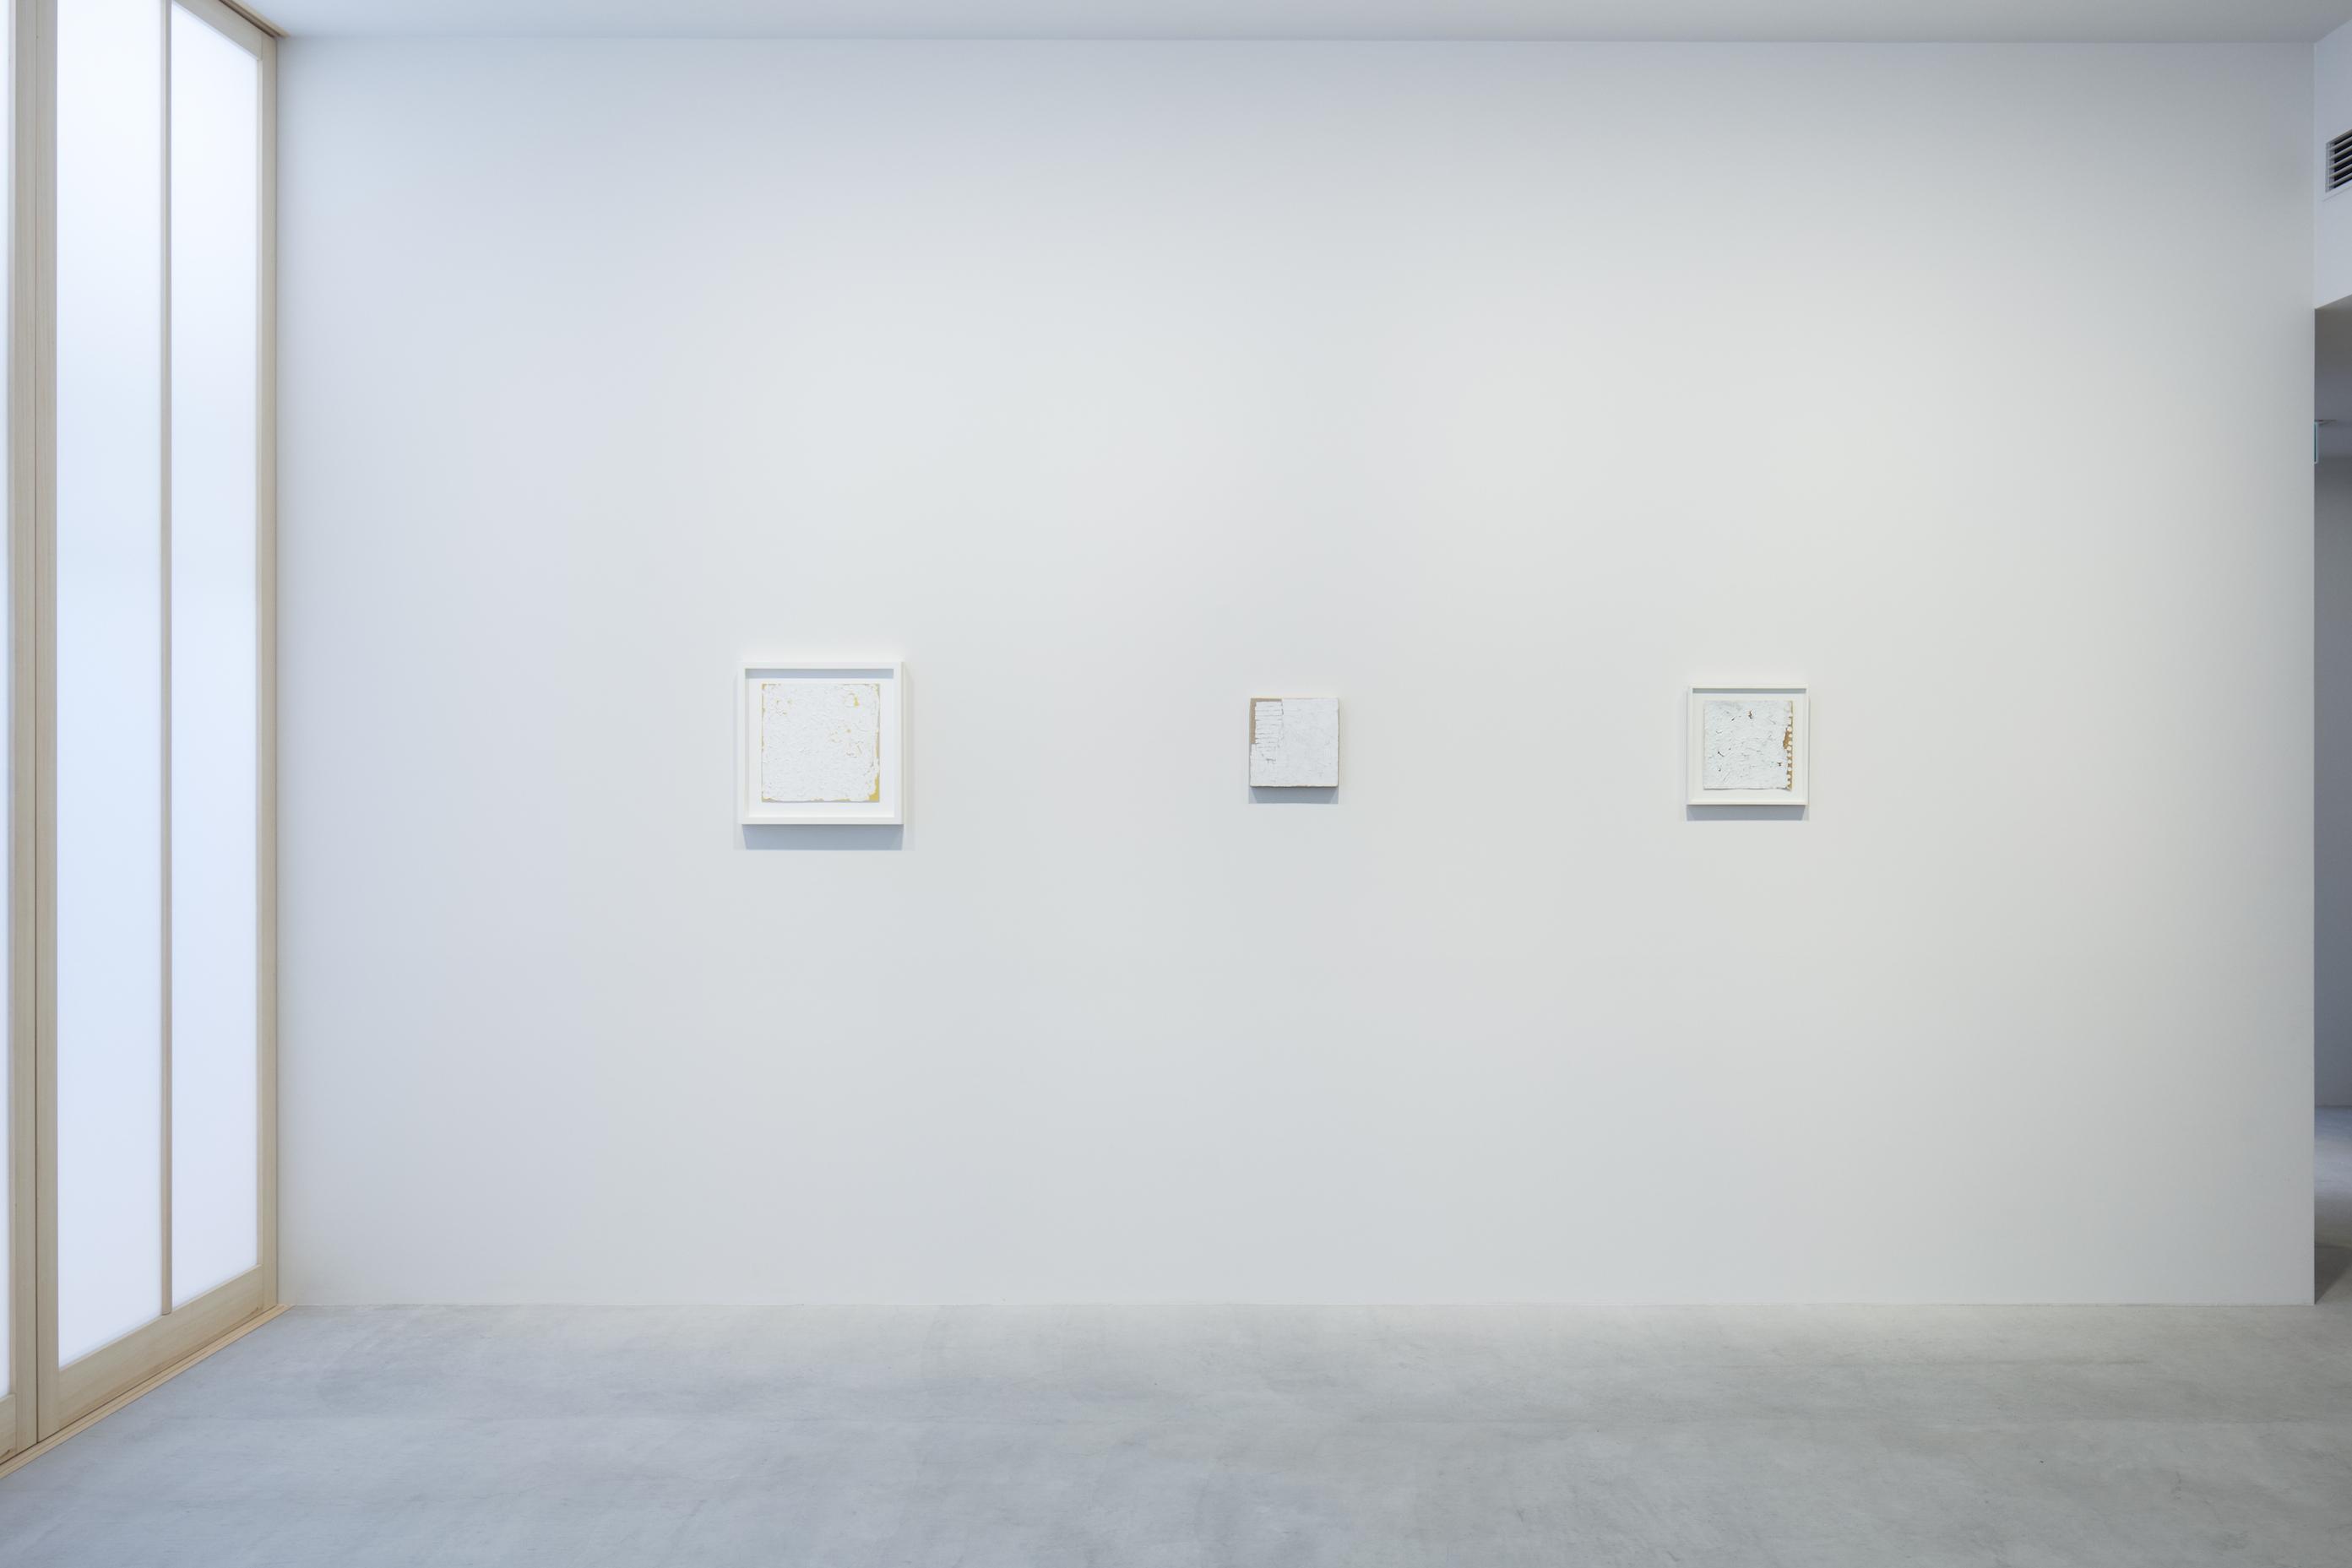 Photograph 2 from Robert Ryman exhibition.